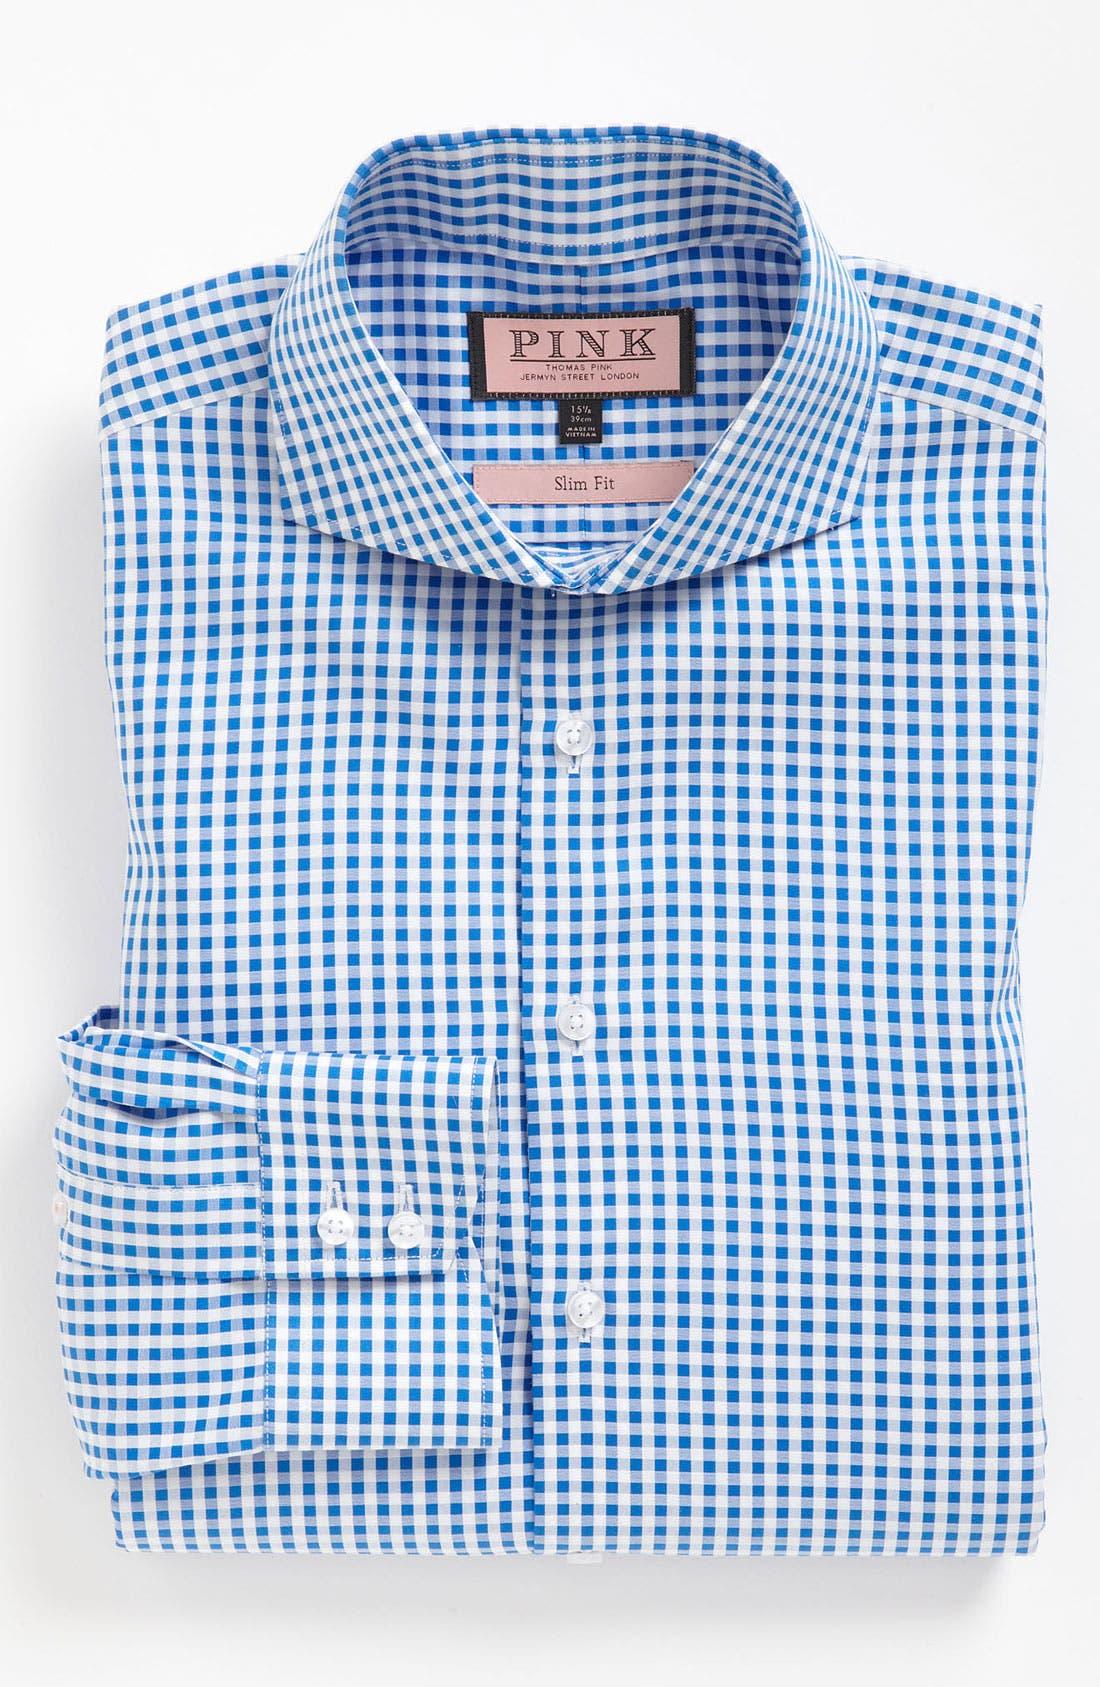 Main Image - Thomas Pink Slim Fit Dress Shirt